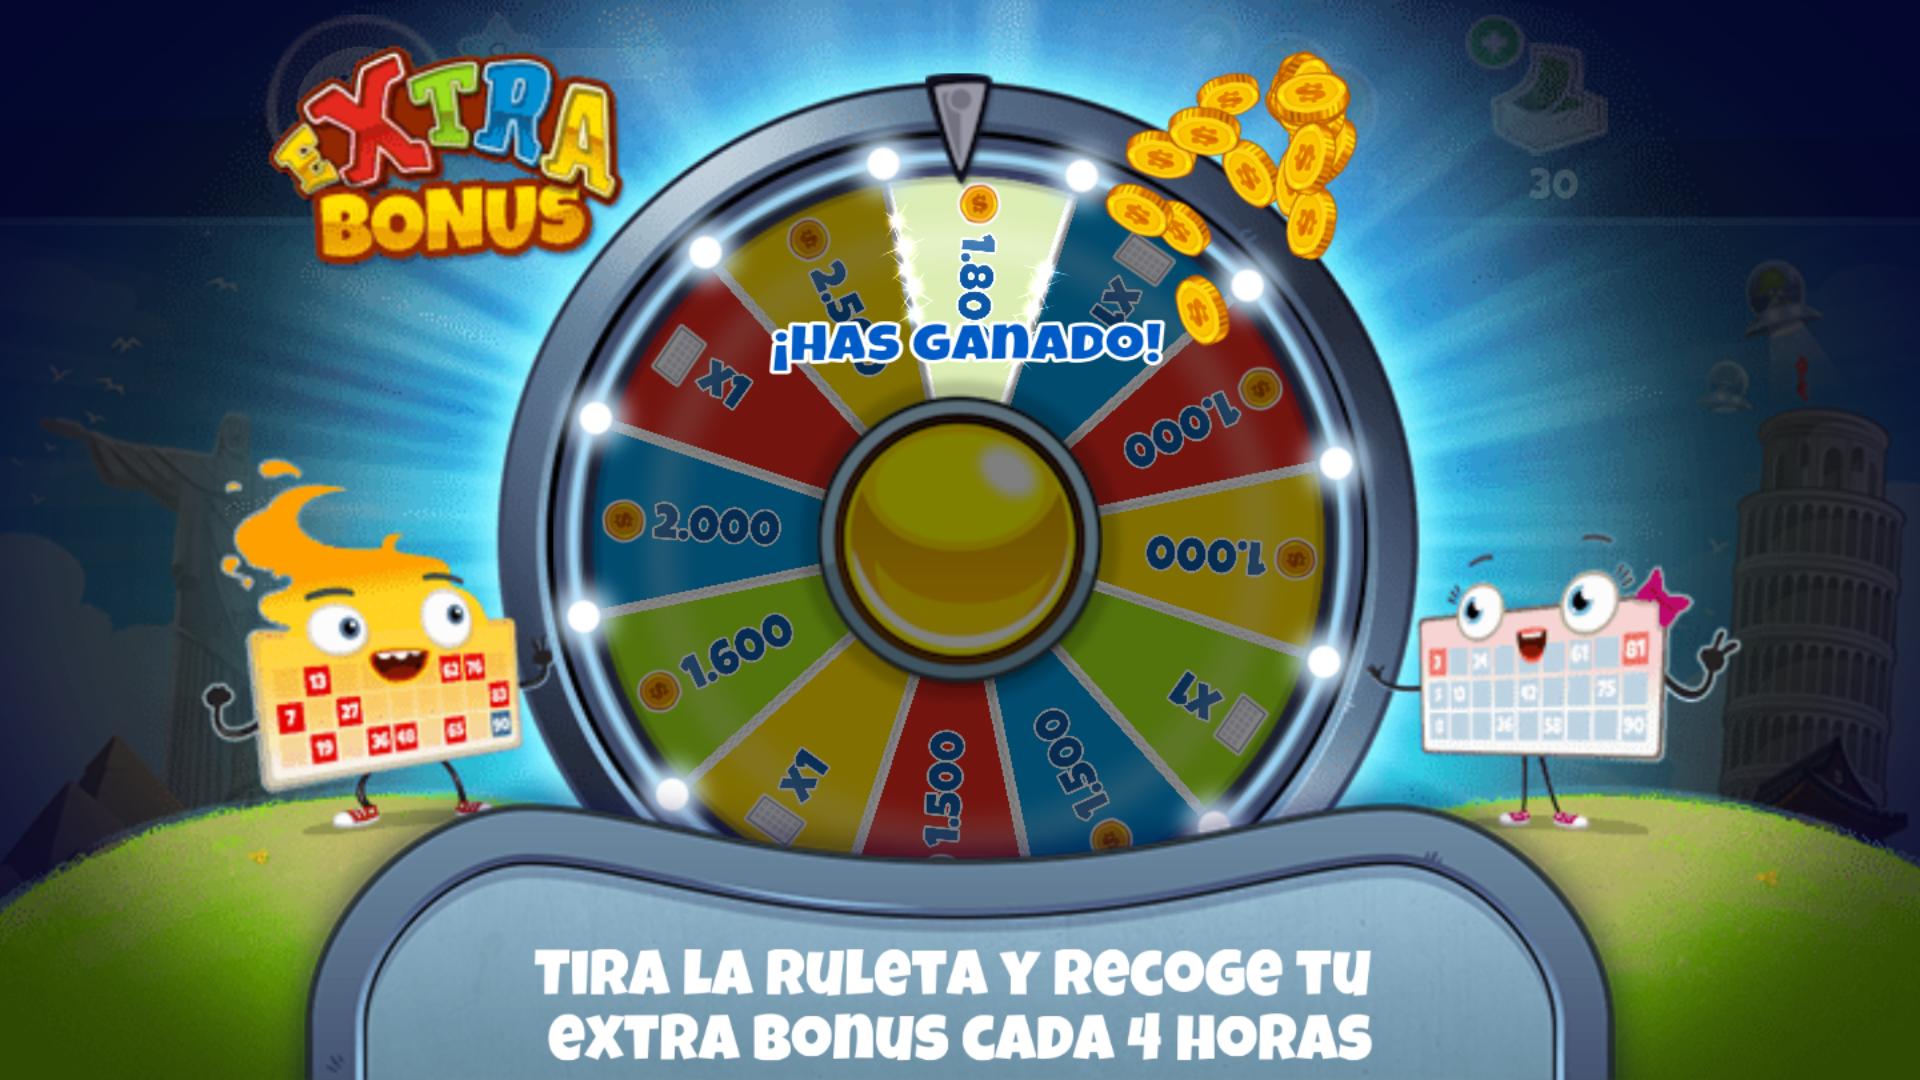 Extra_Bonus_1.png